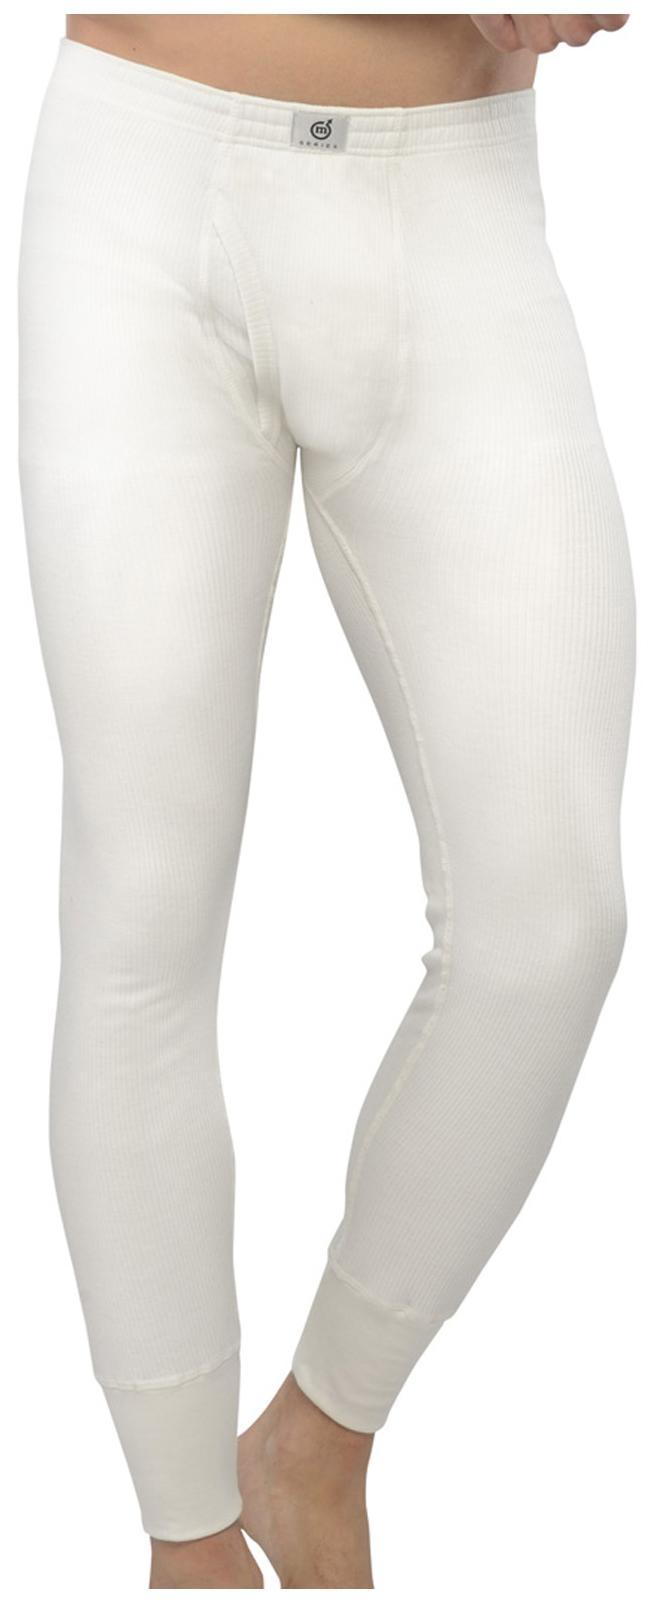 Macroman White Knit Lower Thermal